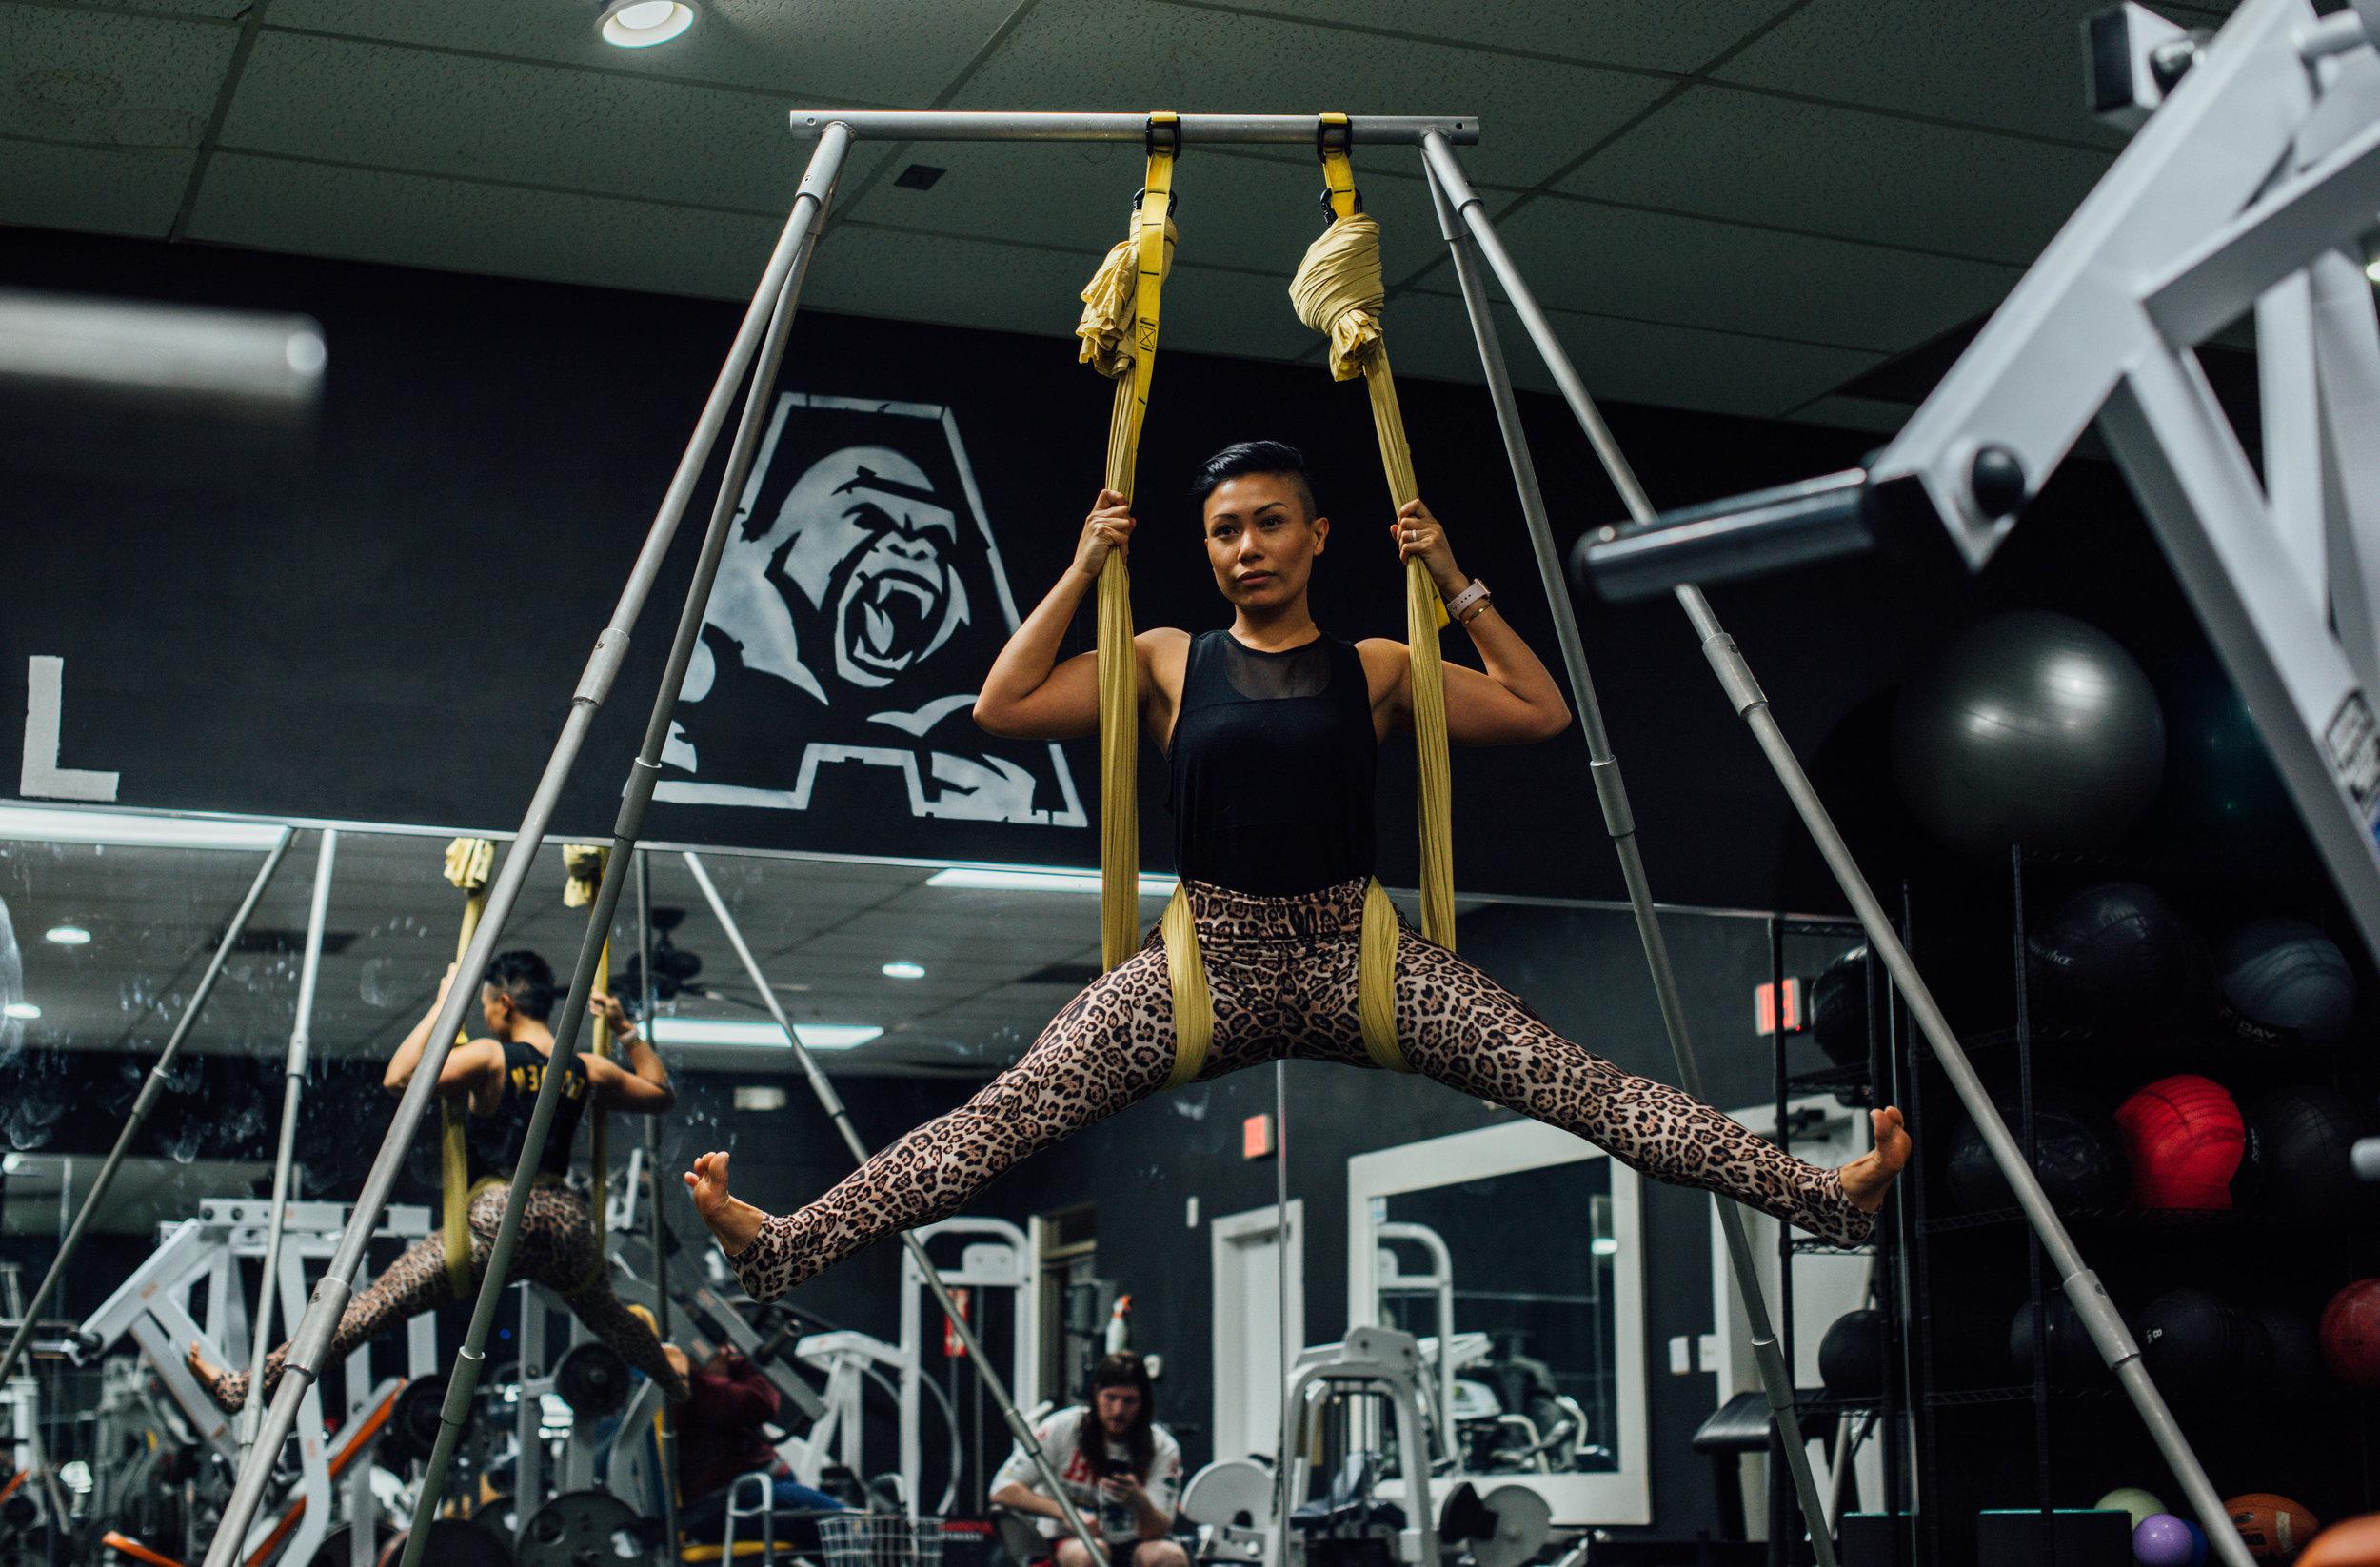 StayGolden-Aerial-Yoga-Studio-Merrifield.jpg